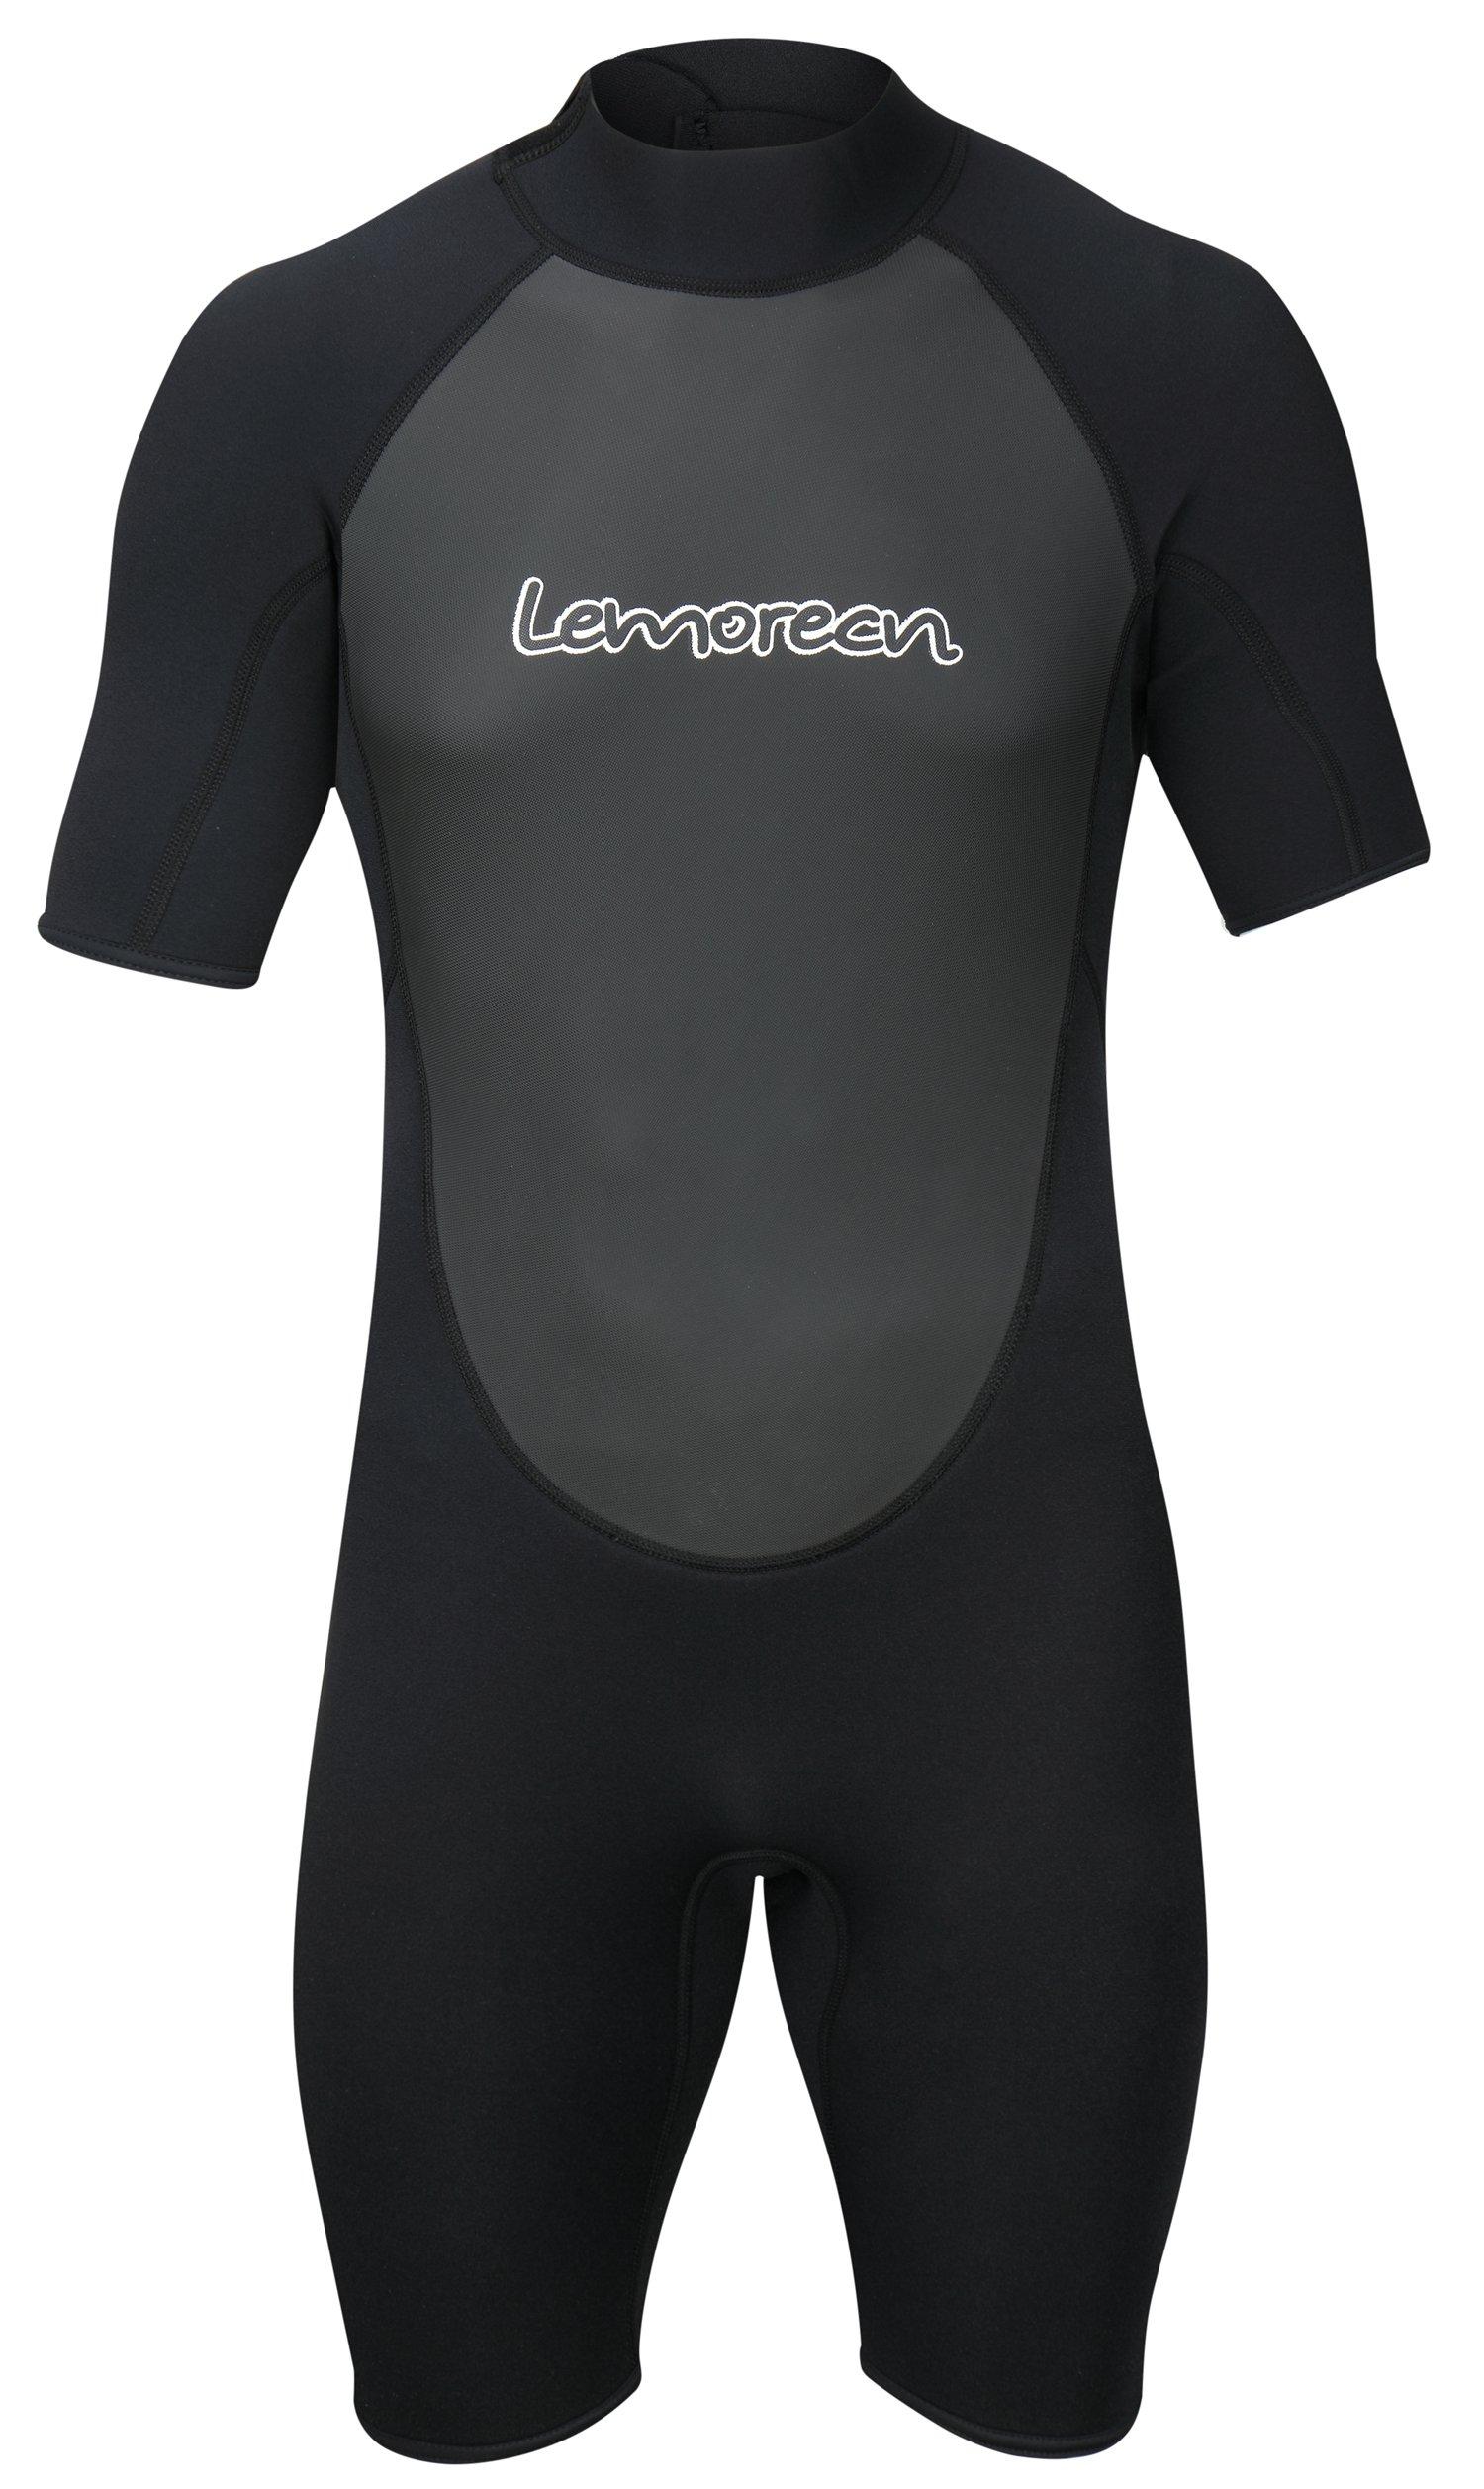 Lemorecn Wetsuits Mens Neoprene 3mm Shorty Diving Suit(3036black-3XL) by Lemorecn (Image #2)